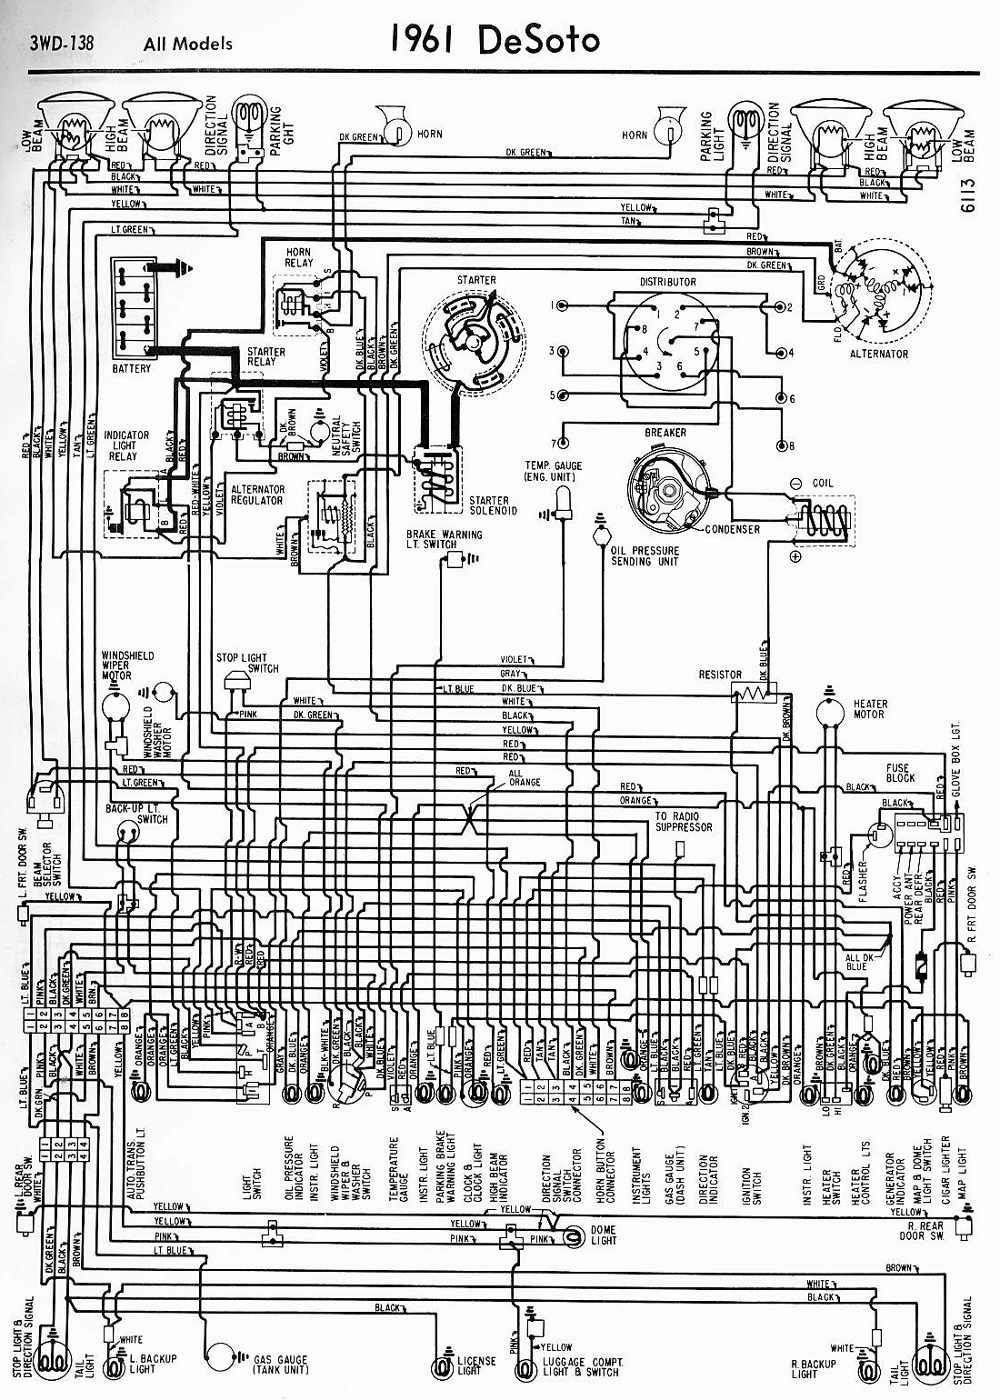 Magnificent Mga 1500 Wiring Diagram Photos - Wiring Diagram Ideas ...